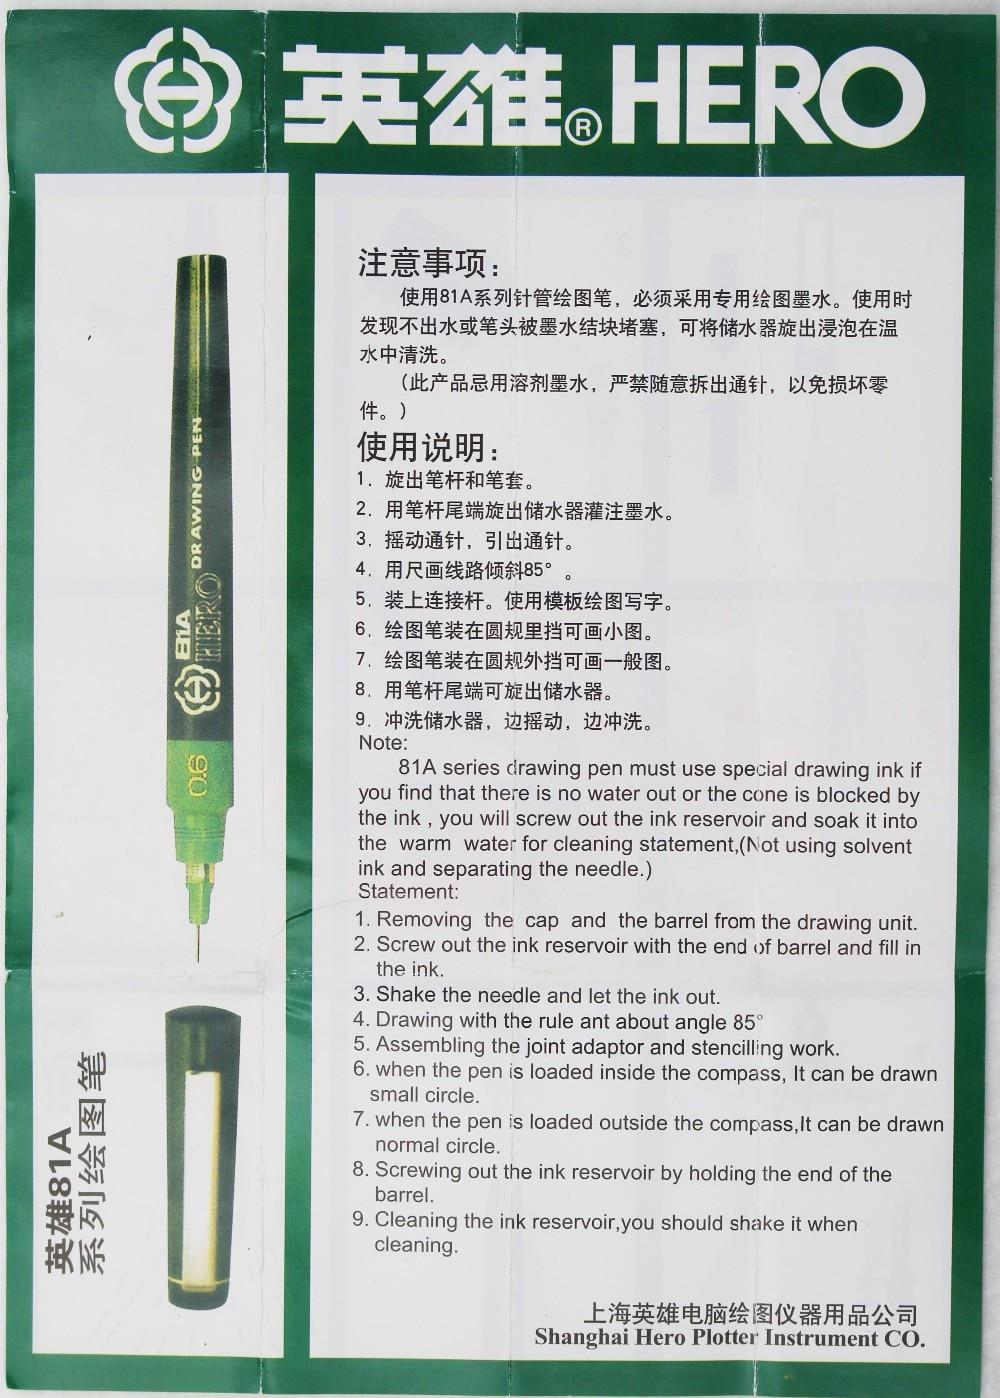 needle drawing pen